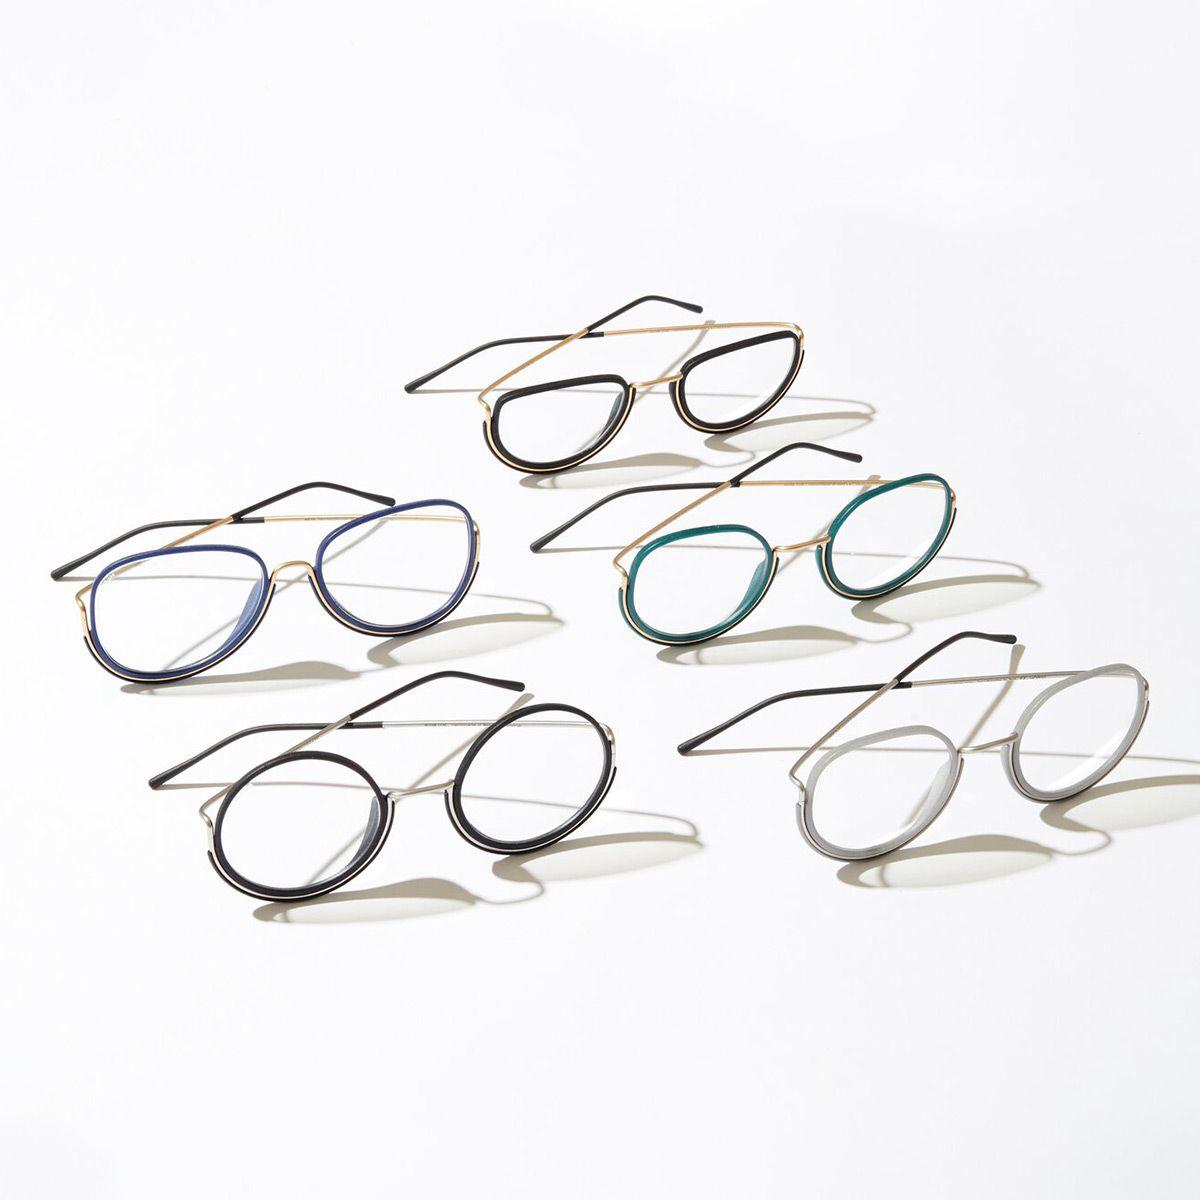 Wires 180º - Silver/Grey